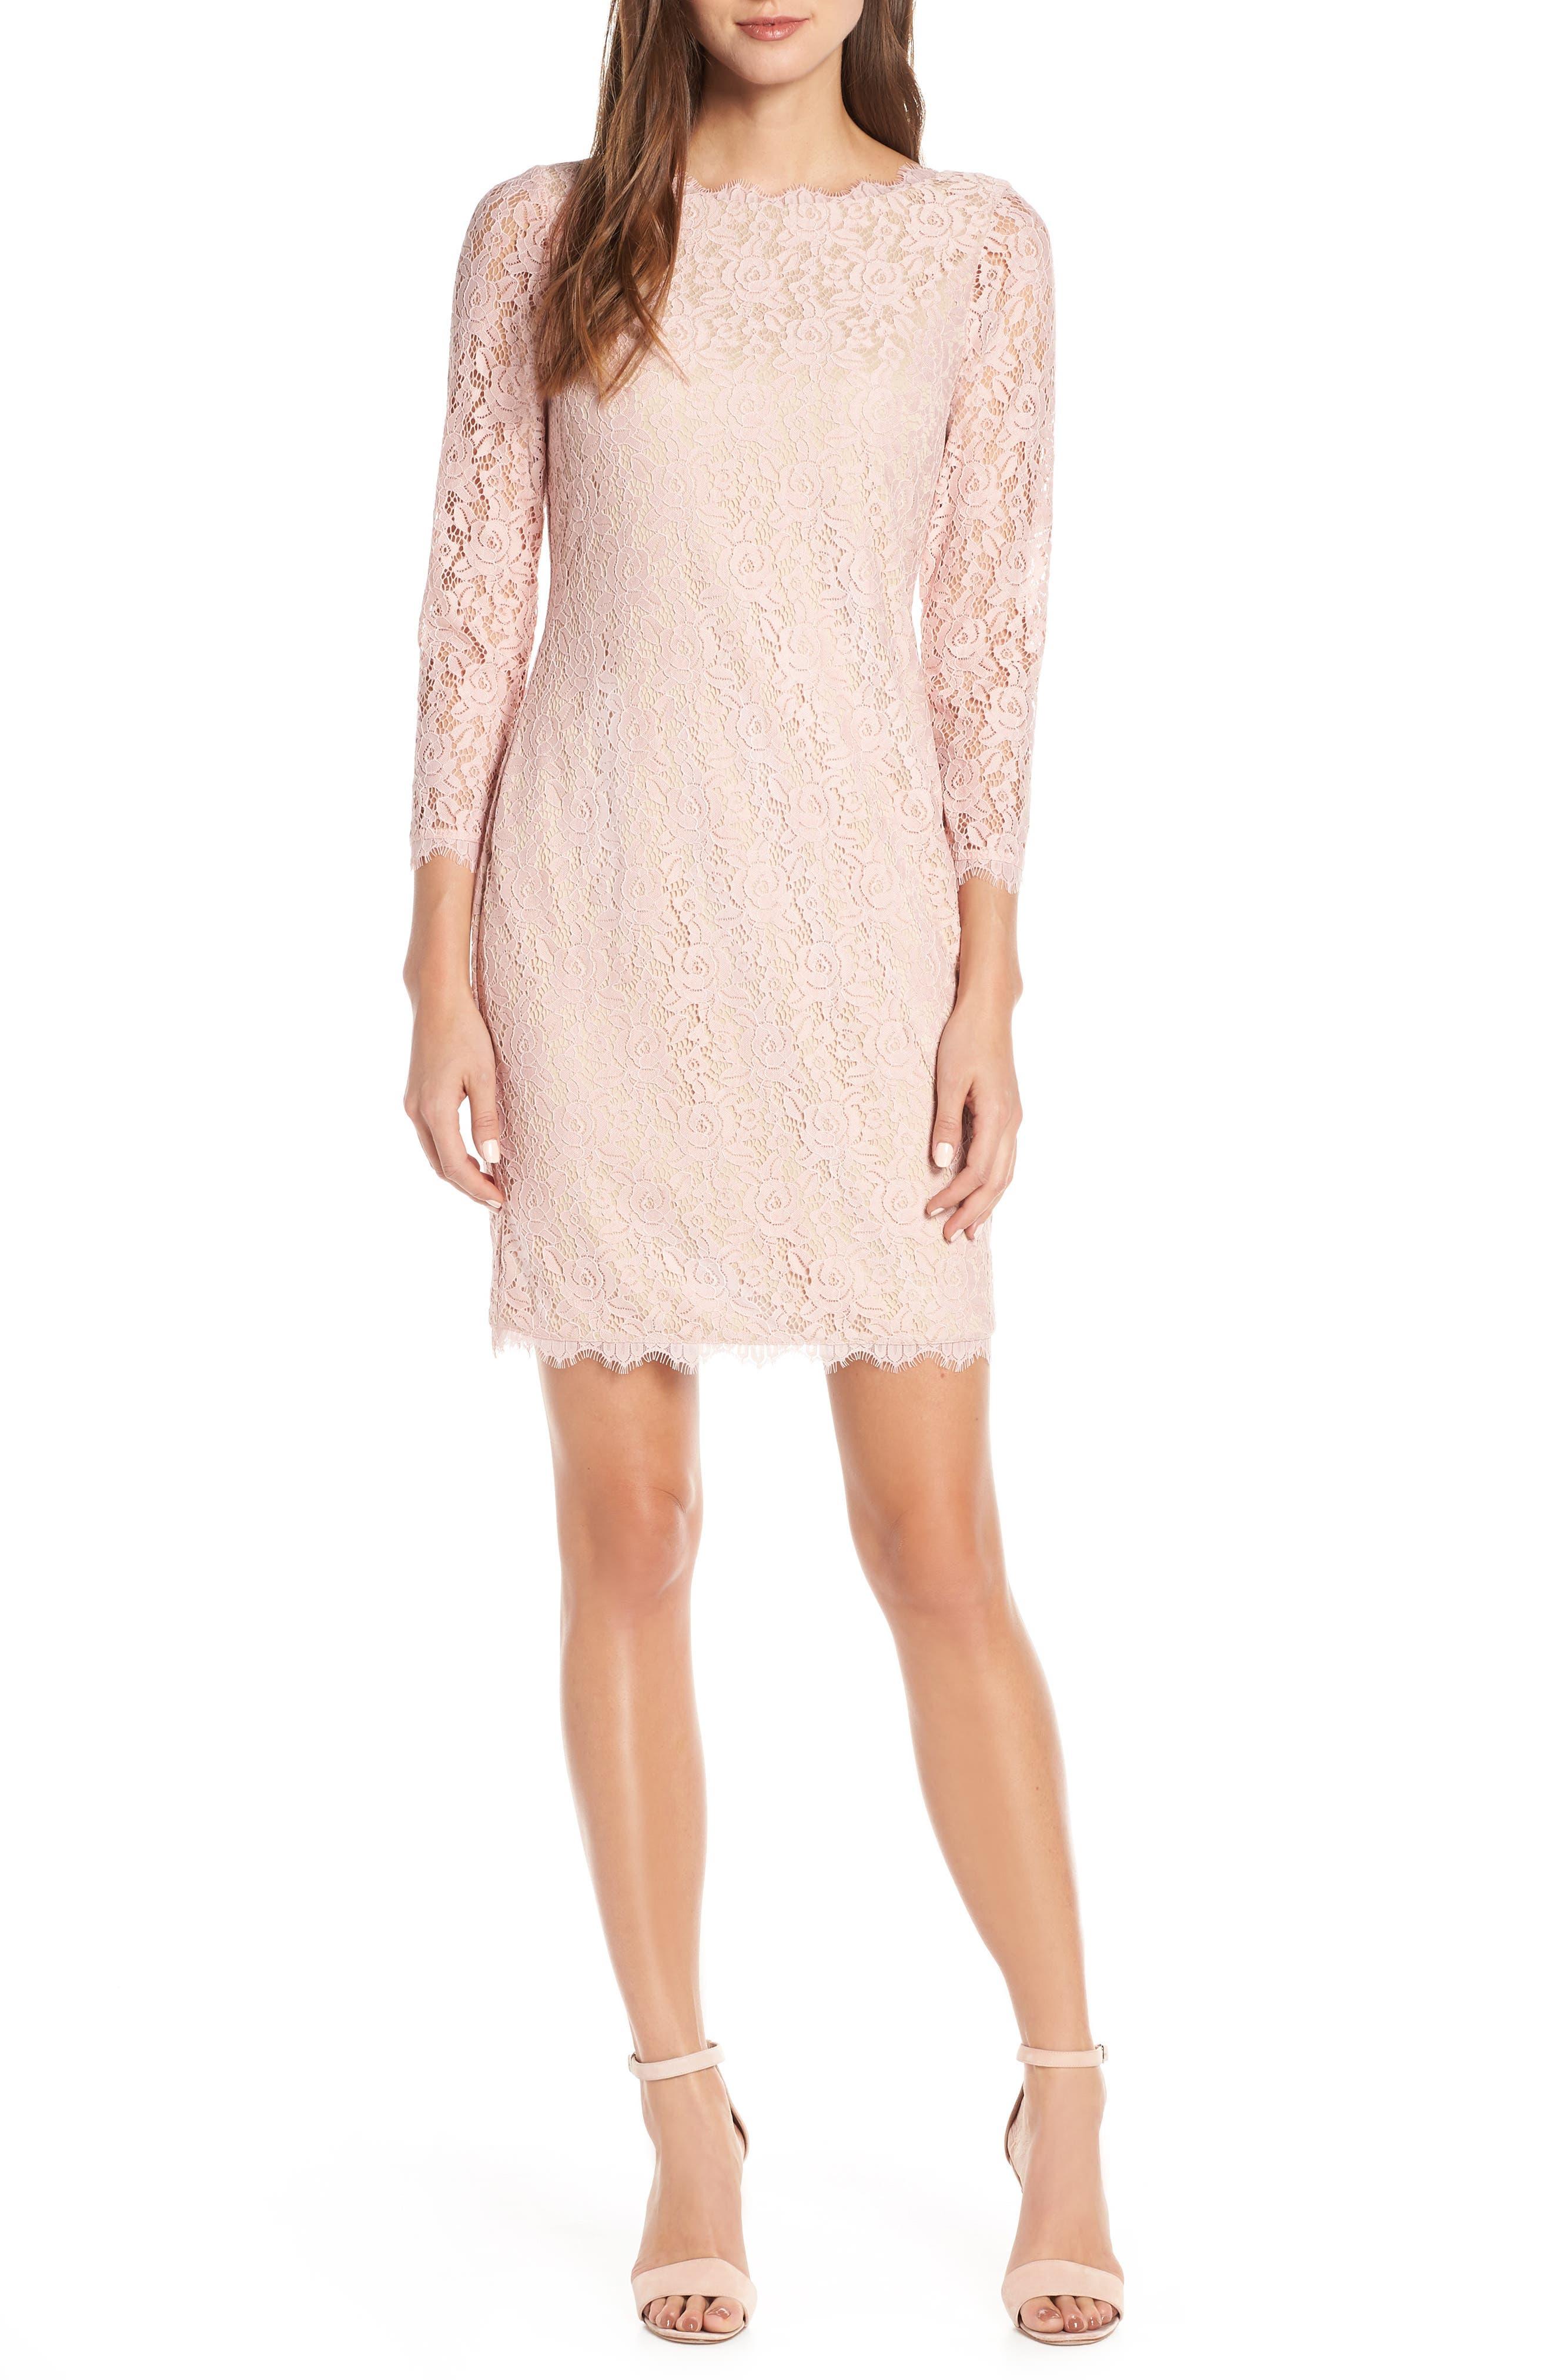 Eliza J Embroidered Lace Sheath, Pink